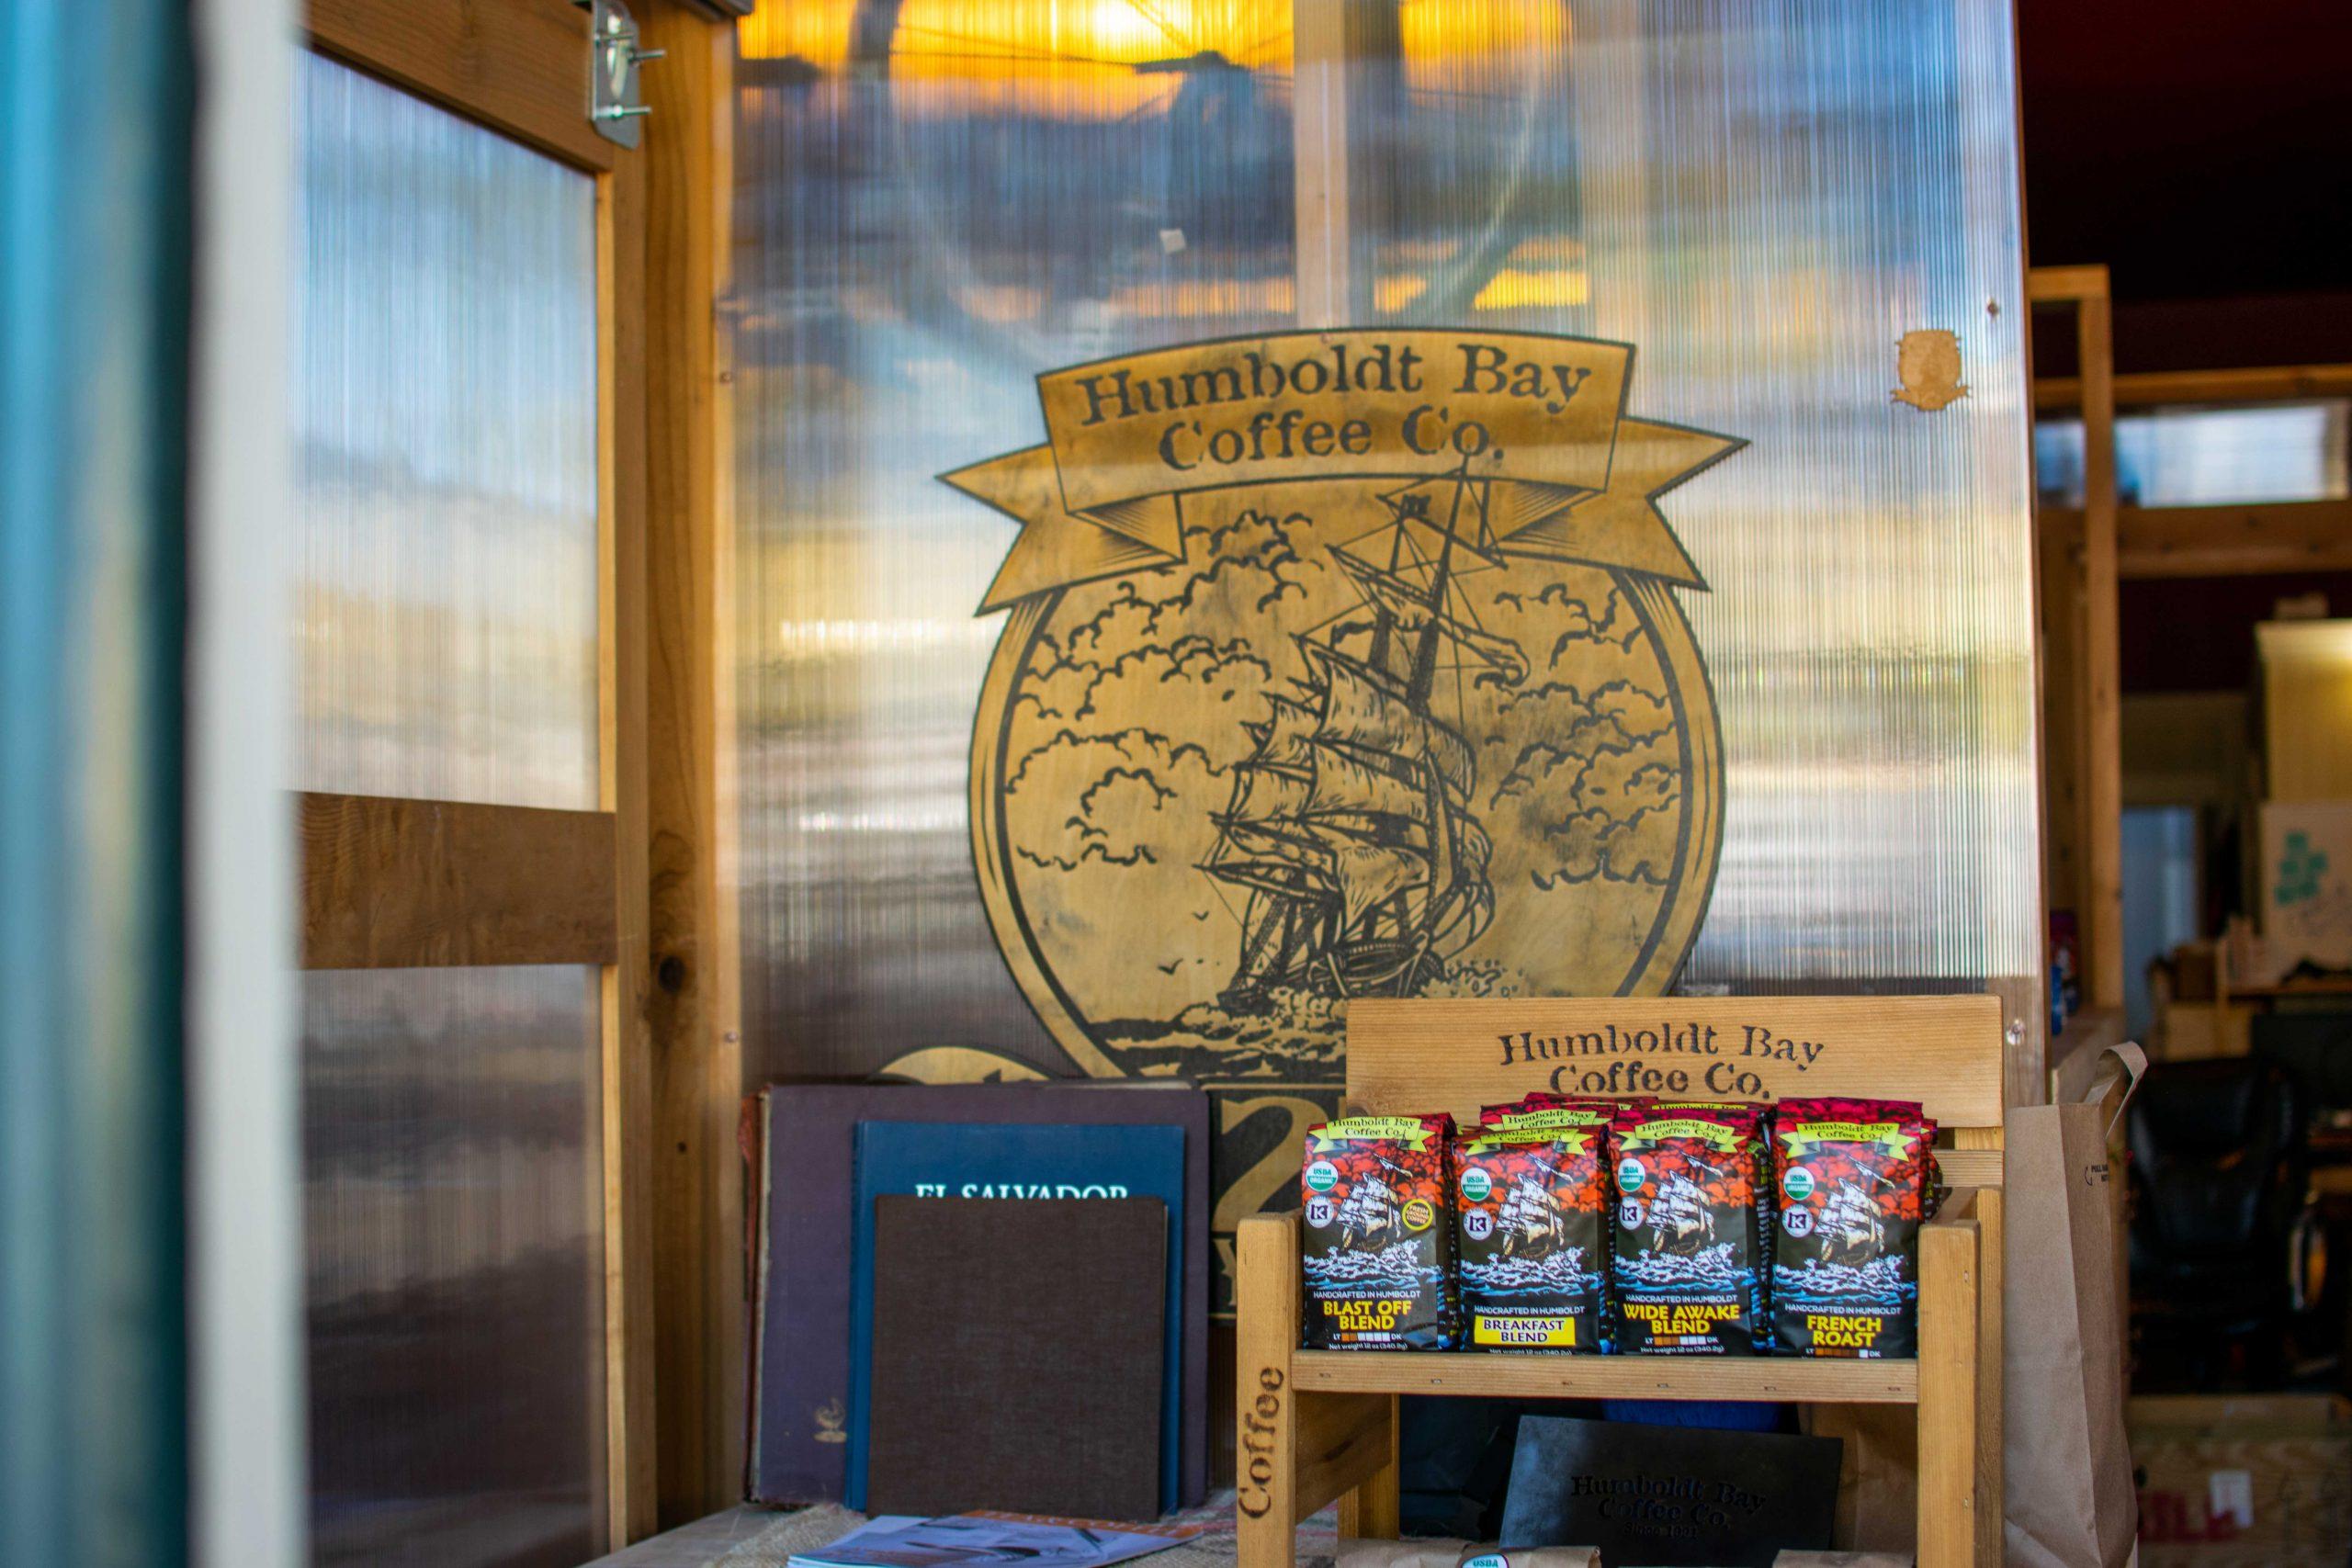 Humboldt Bay Coffee Company